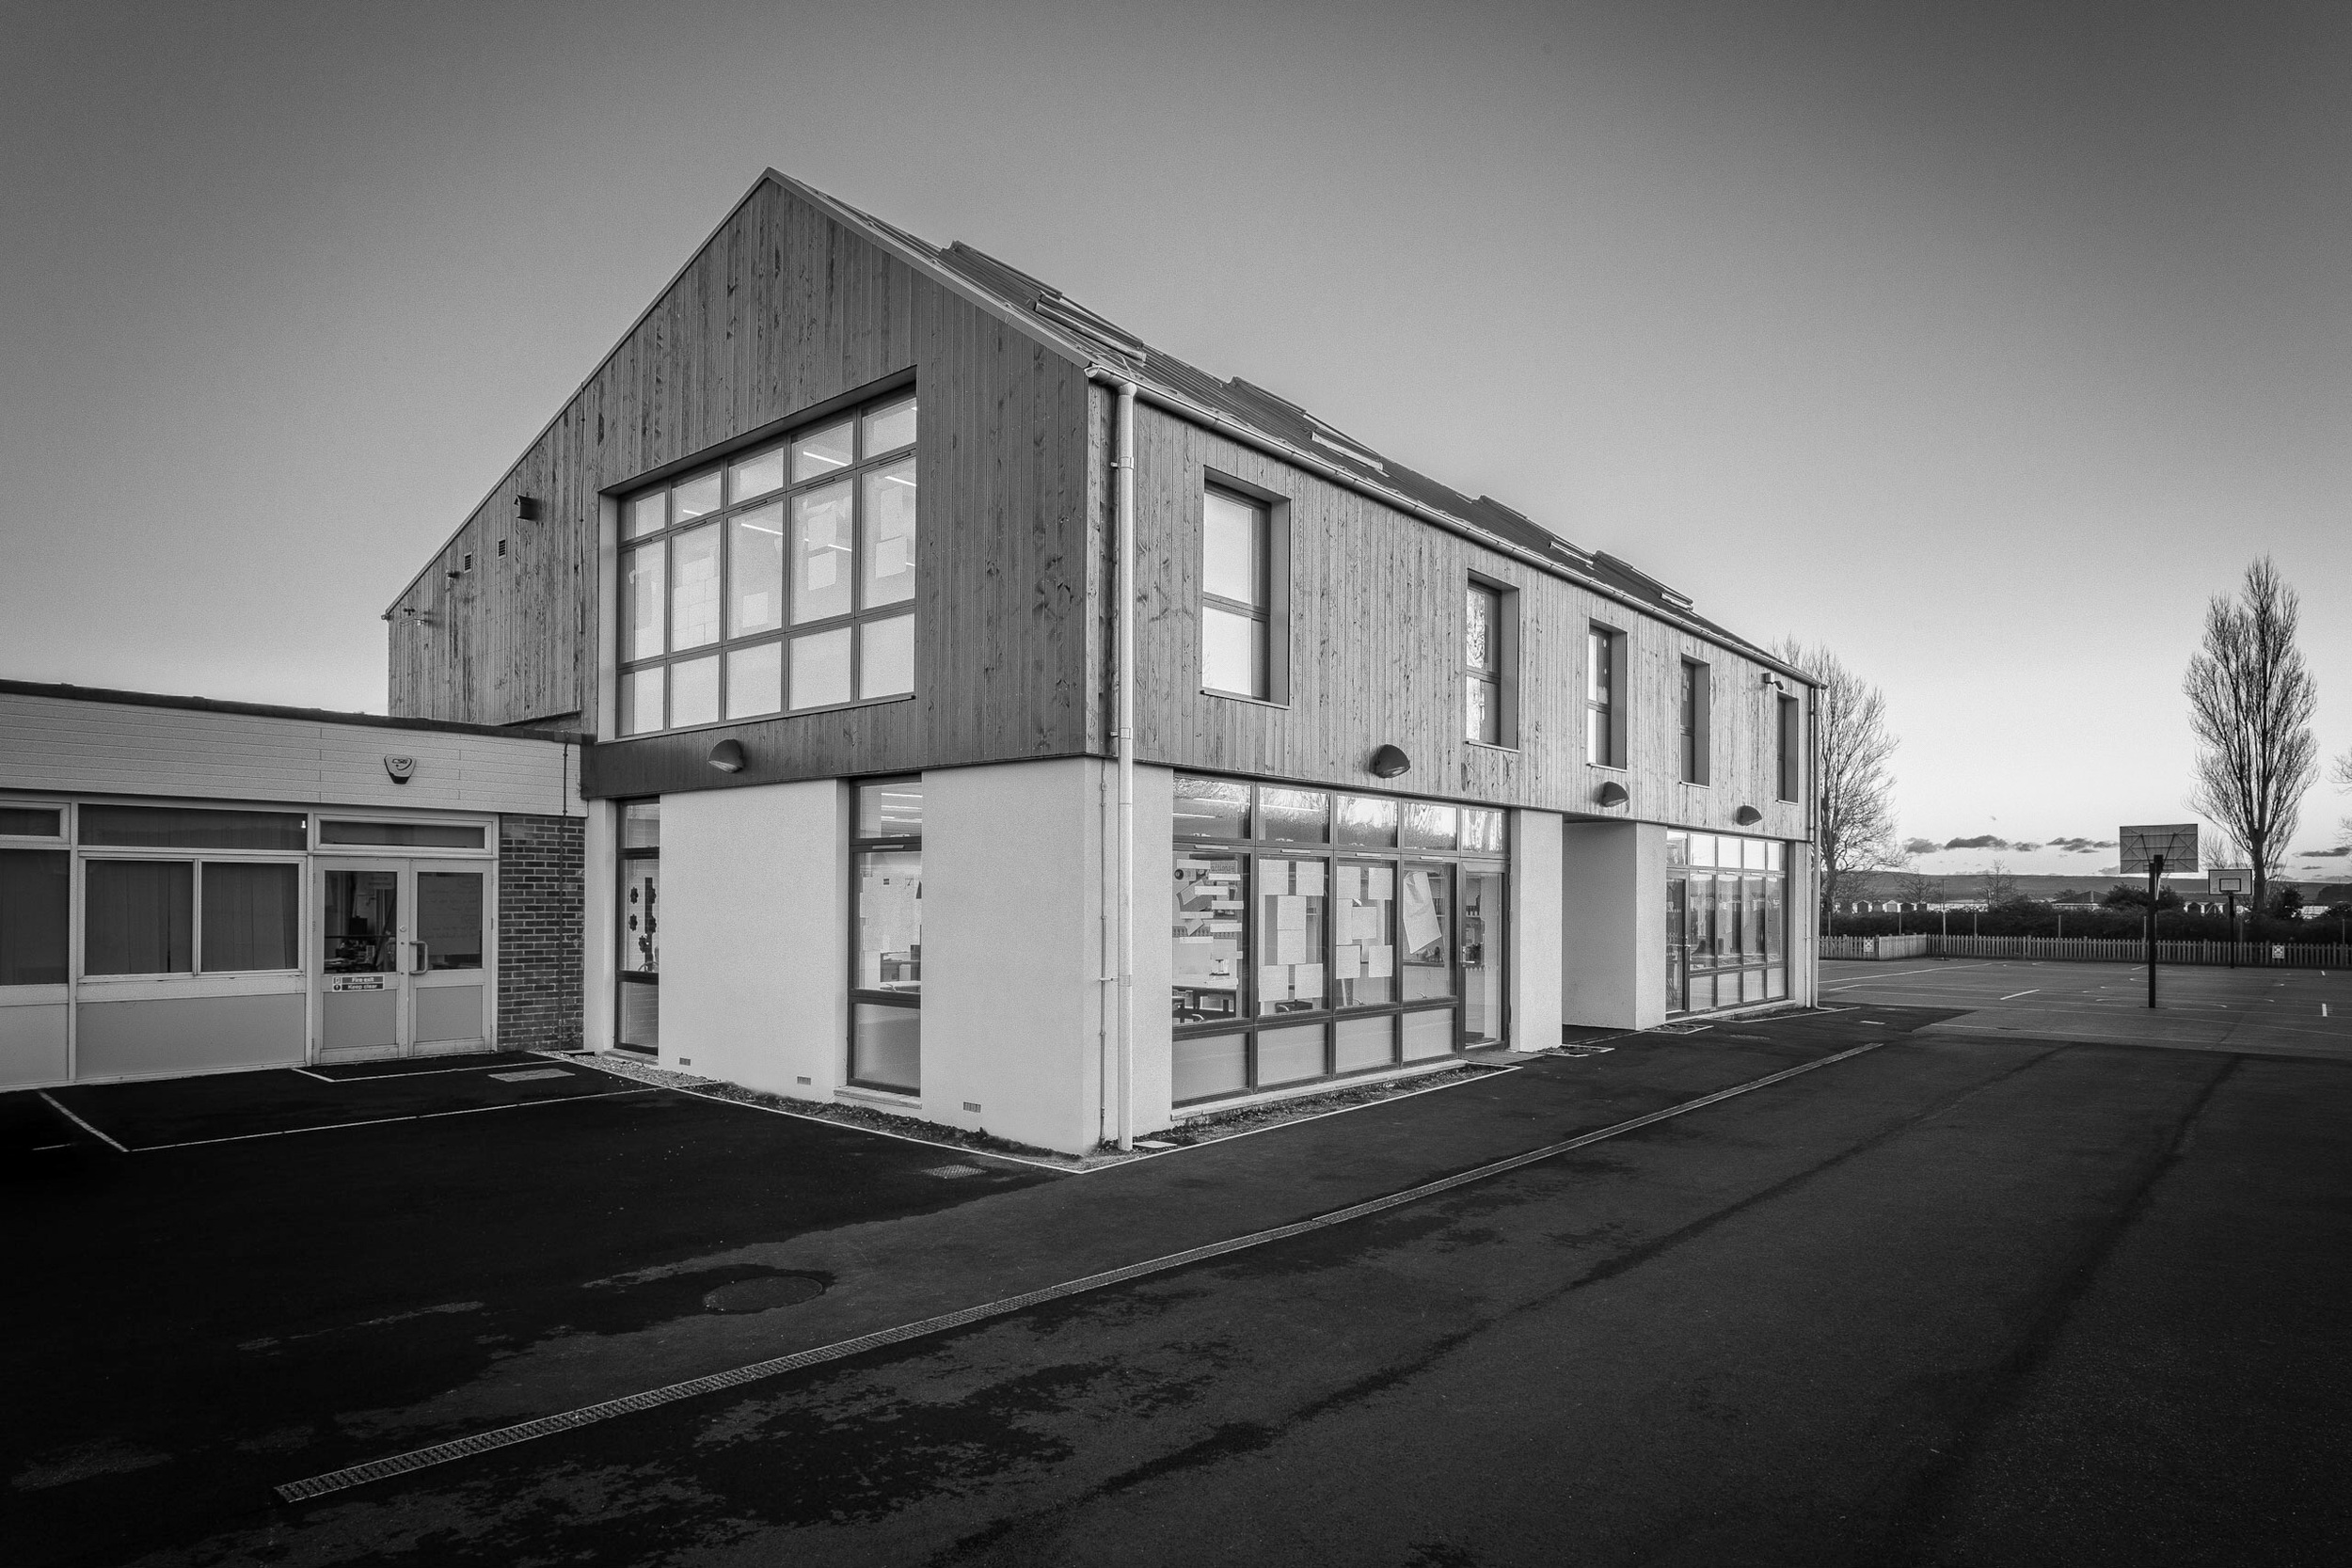 Hamworthy Park Junior School by Rick McEvoy, architectural photographer